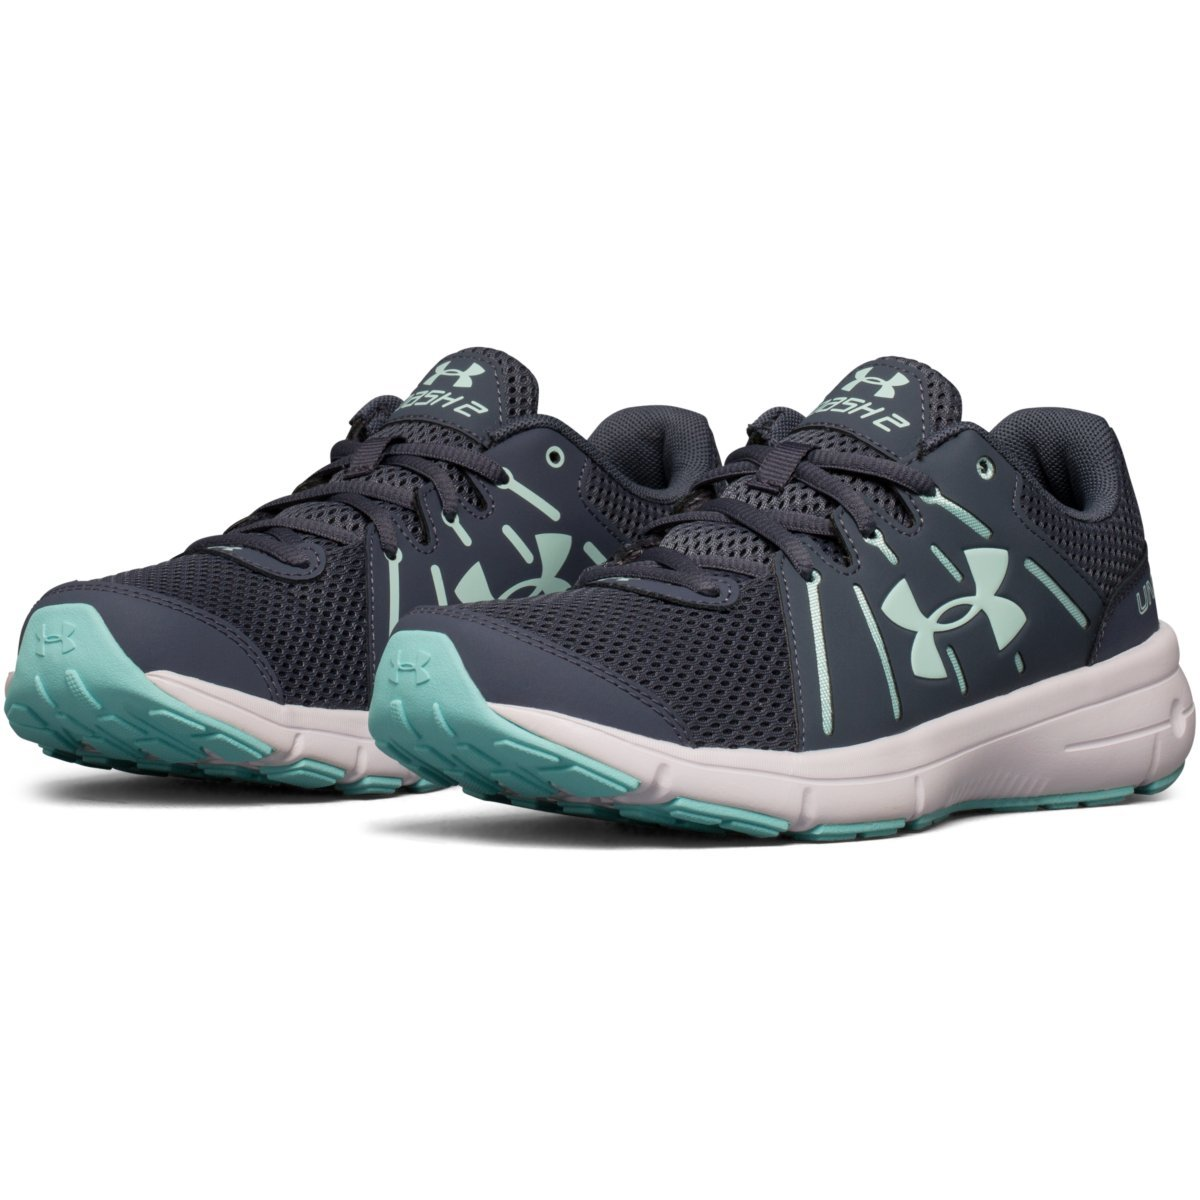 newest 47dad 042d5 UNDER ARMOUR Women's Dash RN 2 Running Shoes, Grey/Mint ...